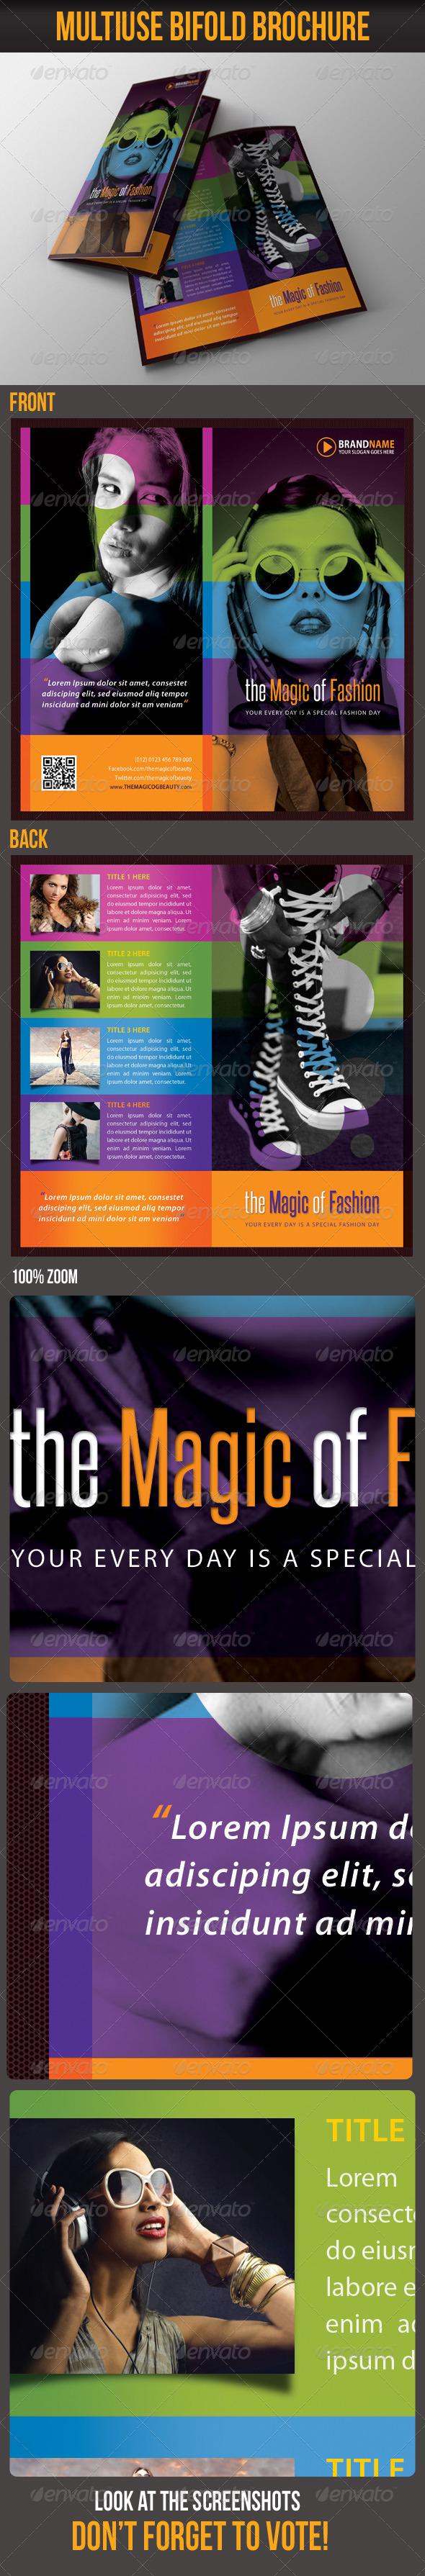 Multiuse Bifold Brochure 20 - Catalogs Brochures